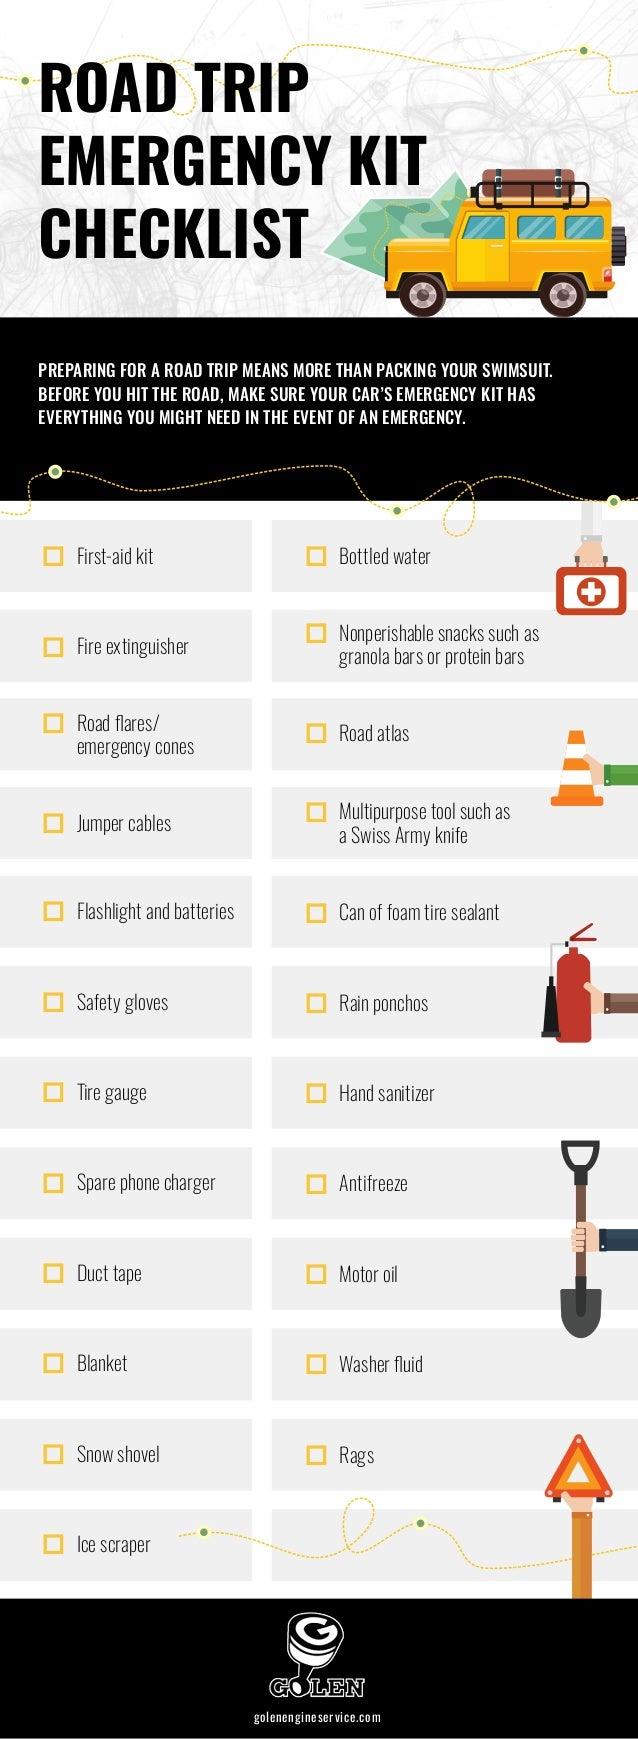 Road Trip Emergency Kit Checklist 1